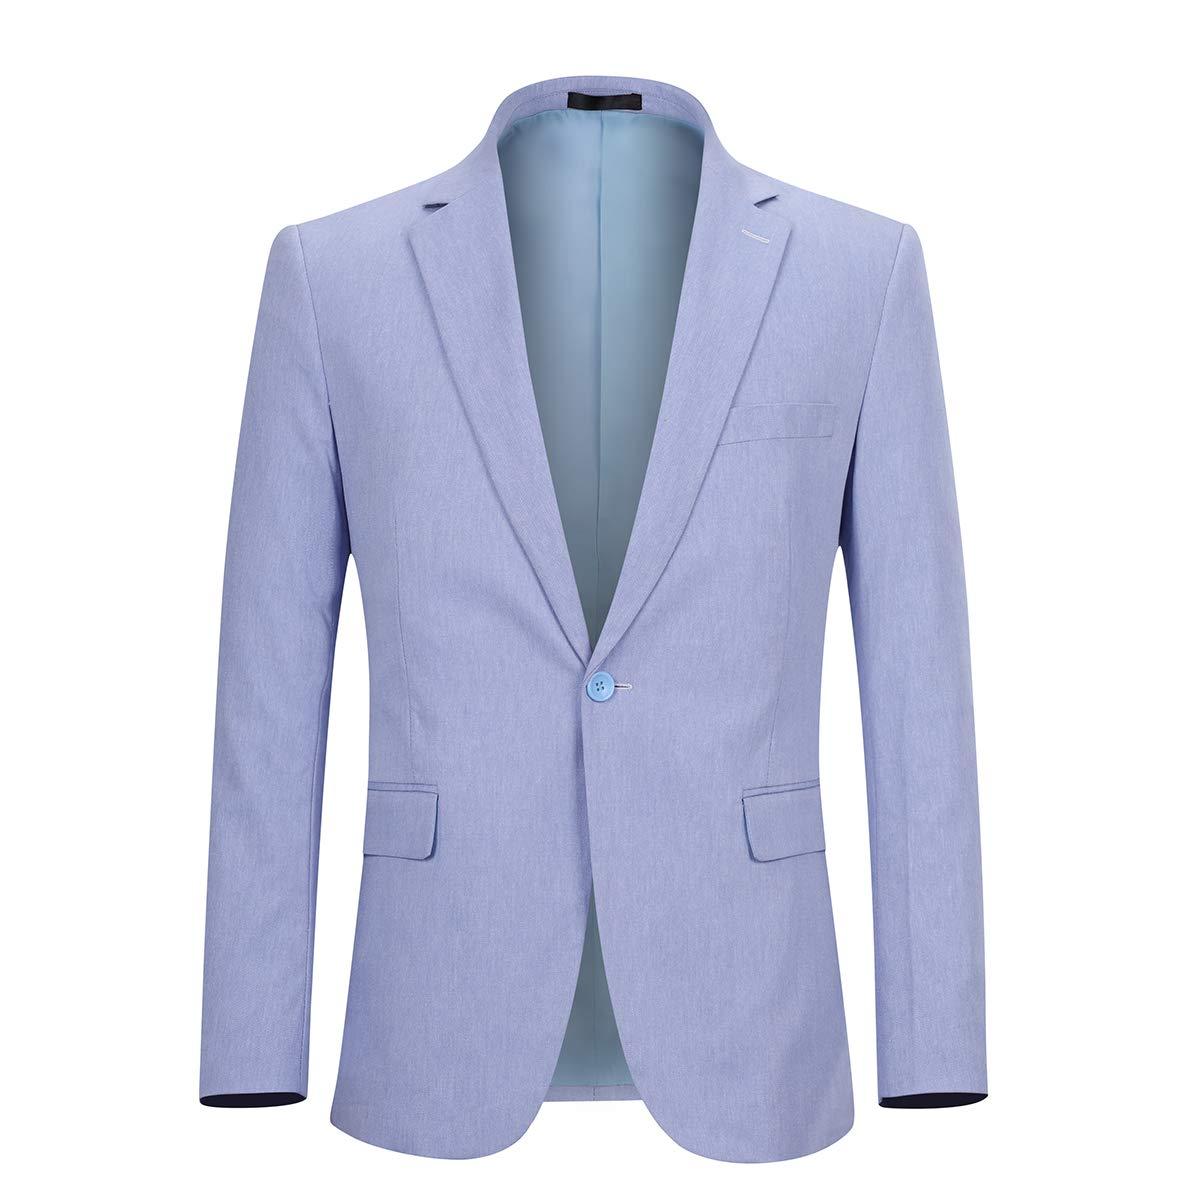 Sliktaa Mens Casual Blazer Suit Jacket Slim Fit Business Wedding Suit Blazer Notched Lapel Single Breast One Button 6 Colors